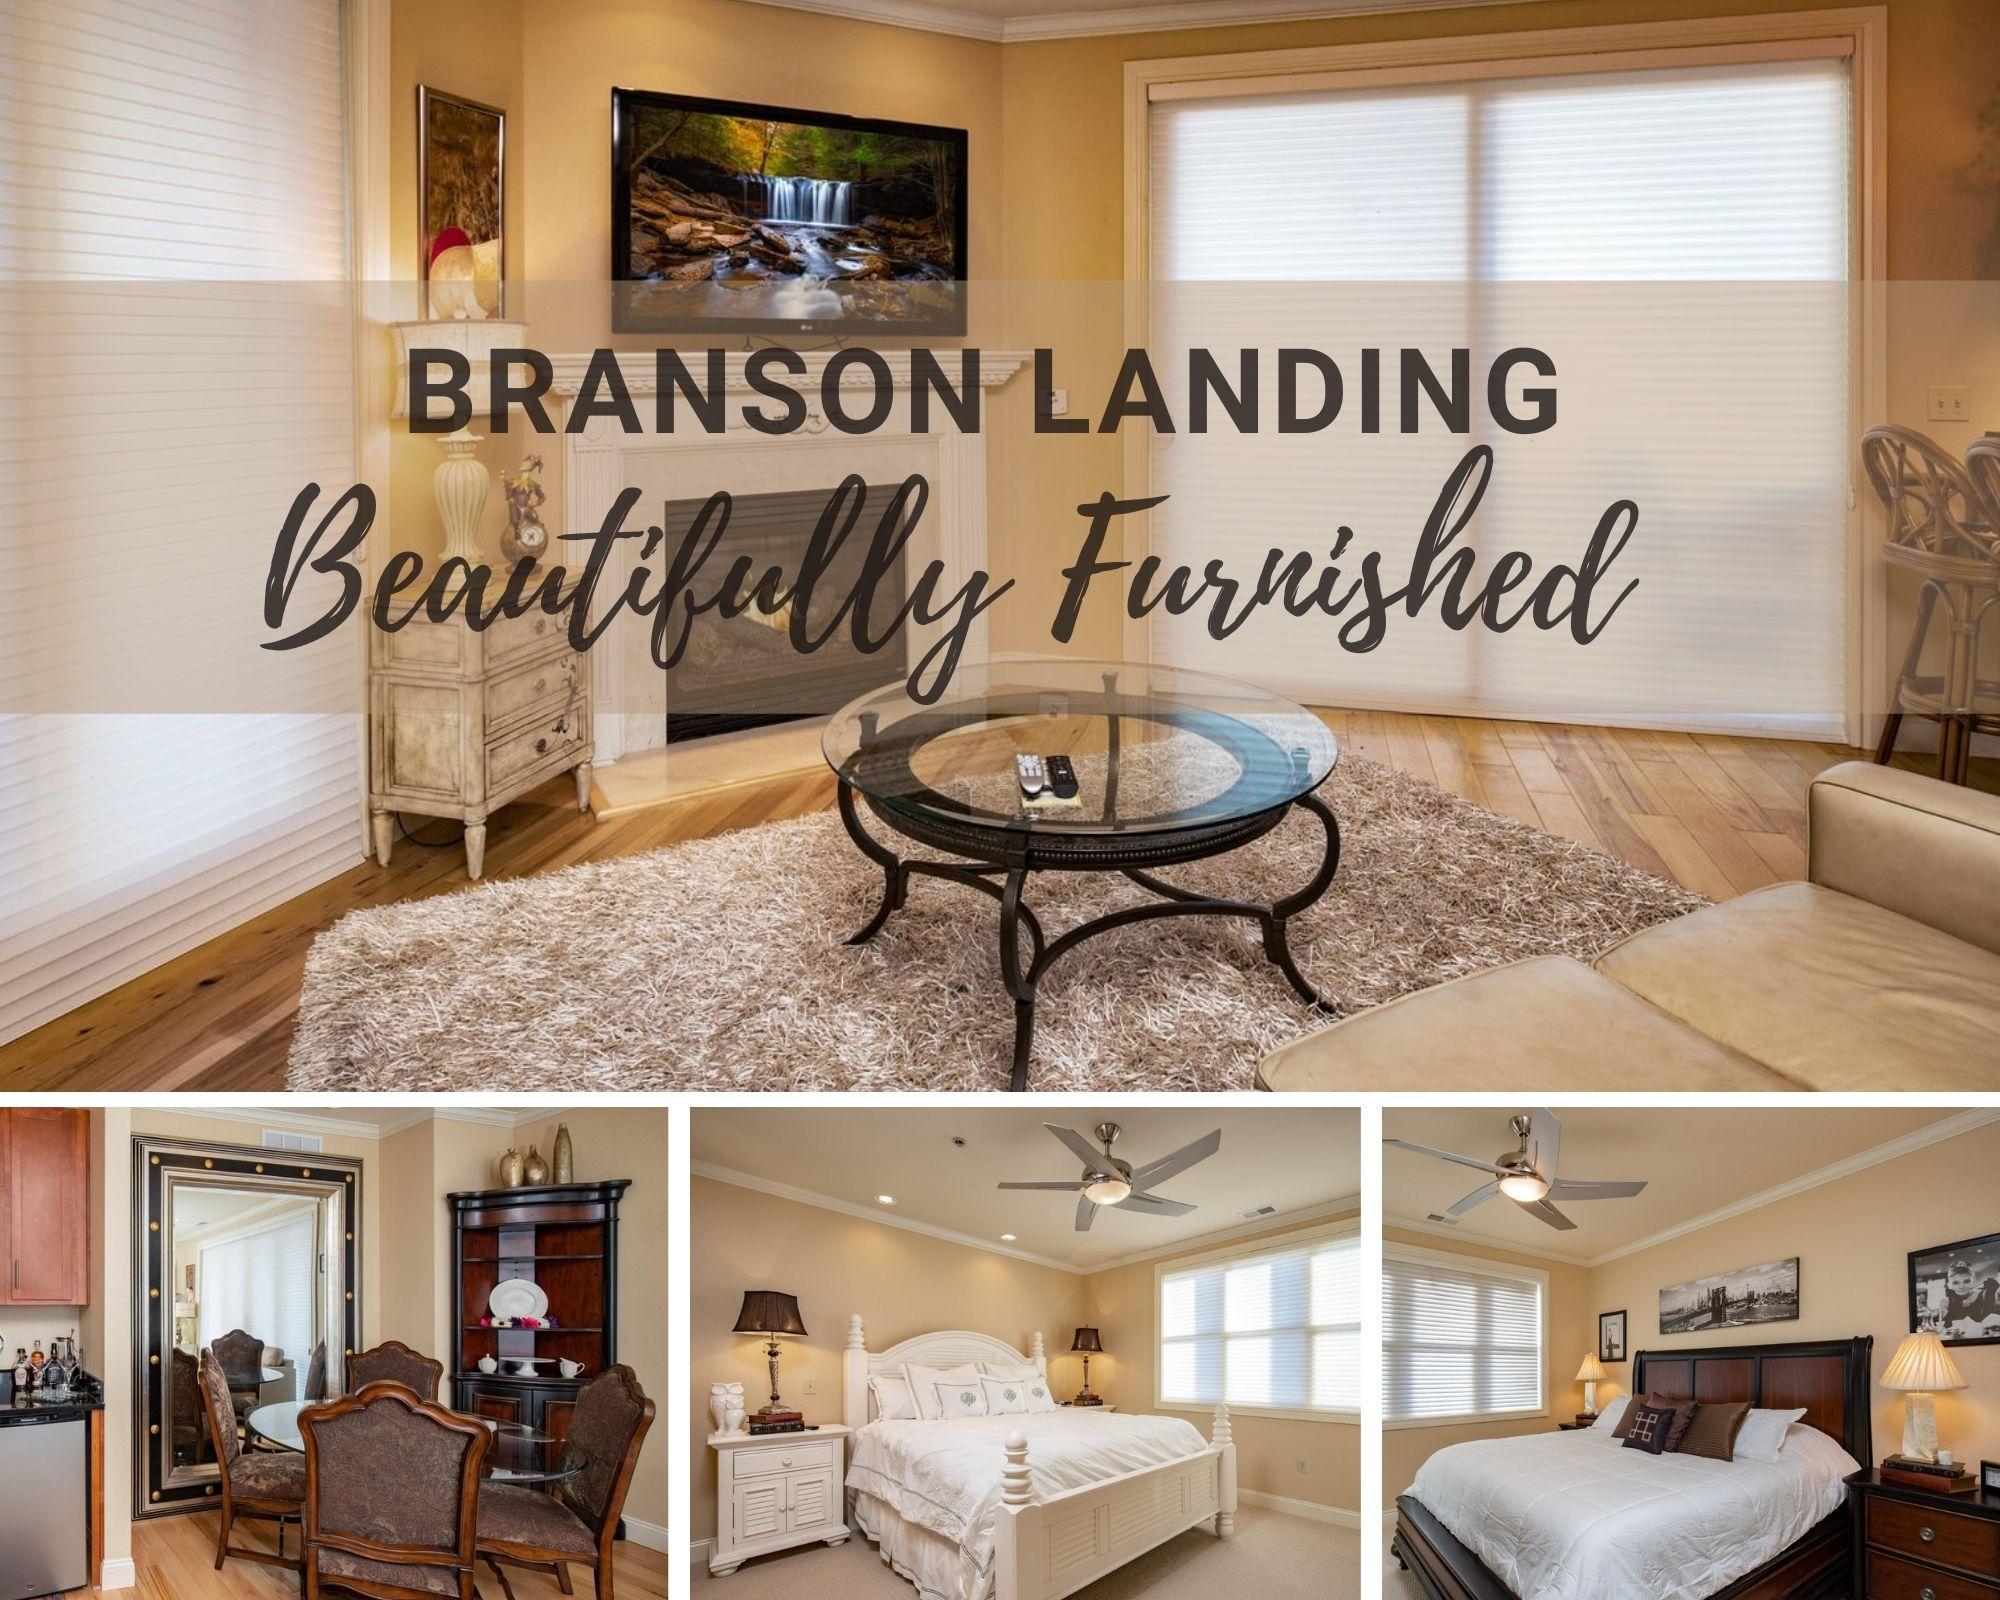 10302 Branson Landing Boulevard UNIT #302 Branson, MO 65616